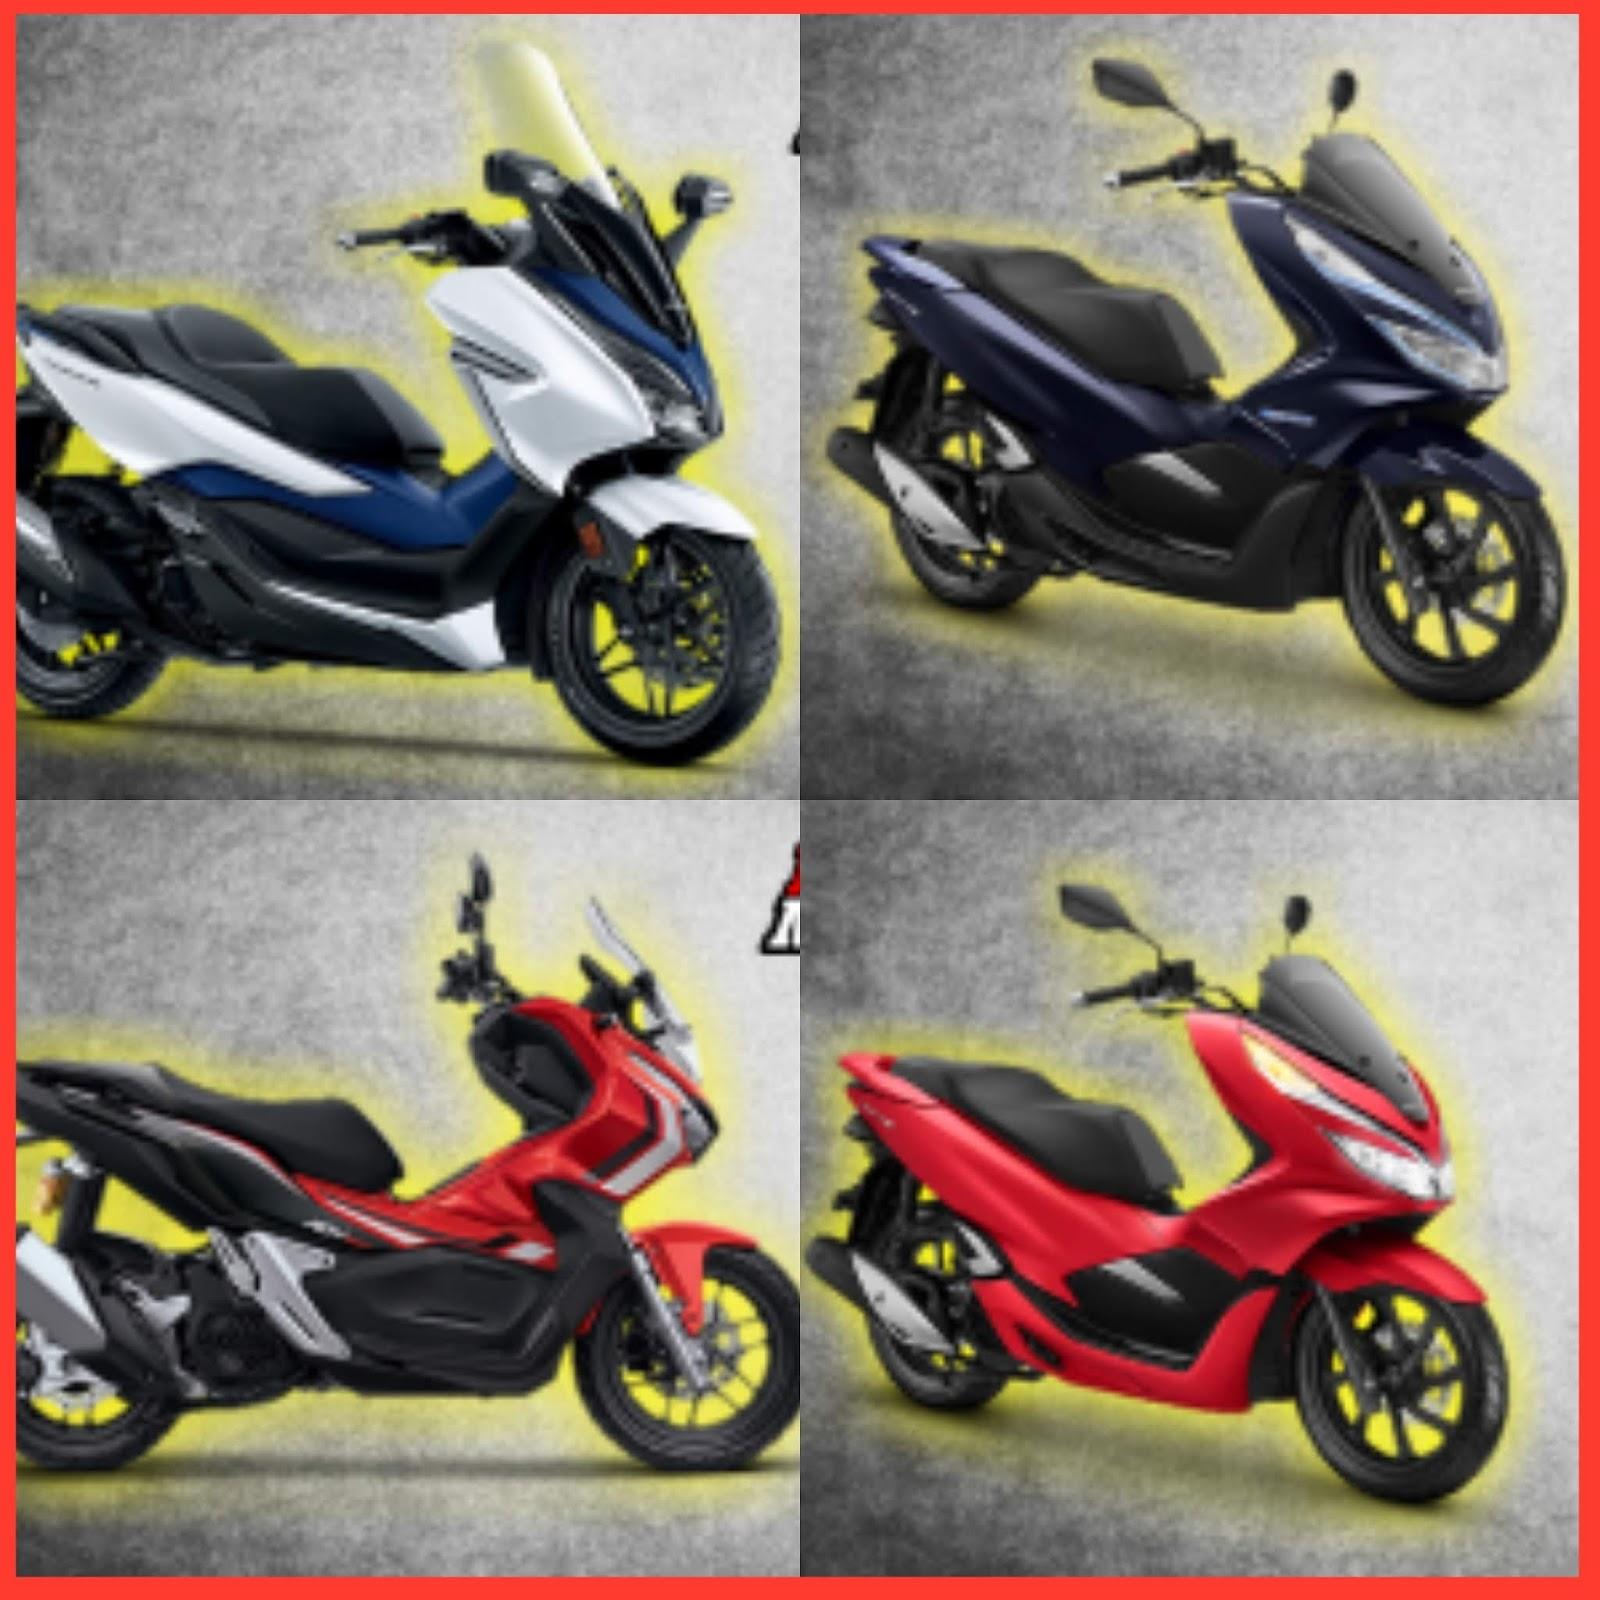 Pilihan Motor Honda Matic Terbaru 2020 Di Indonesia Dudungmaman07